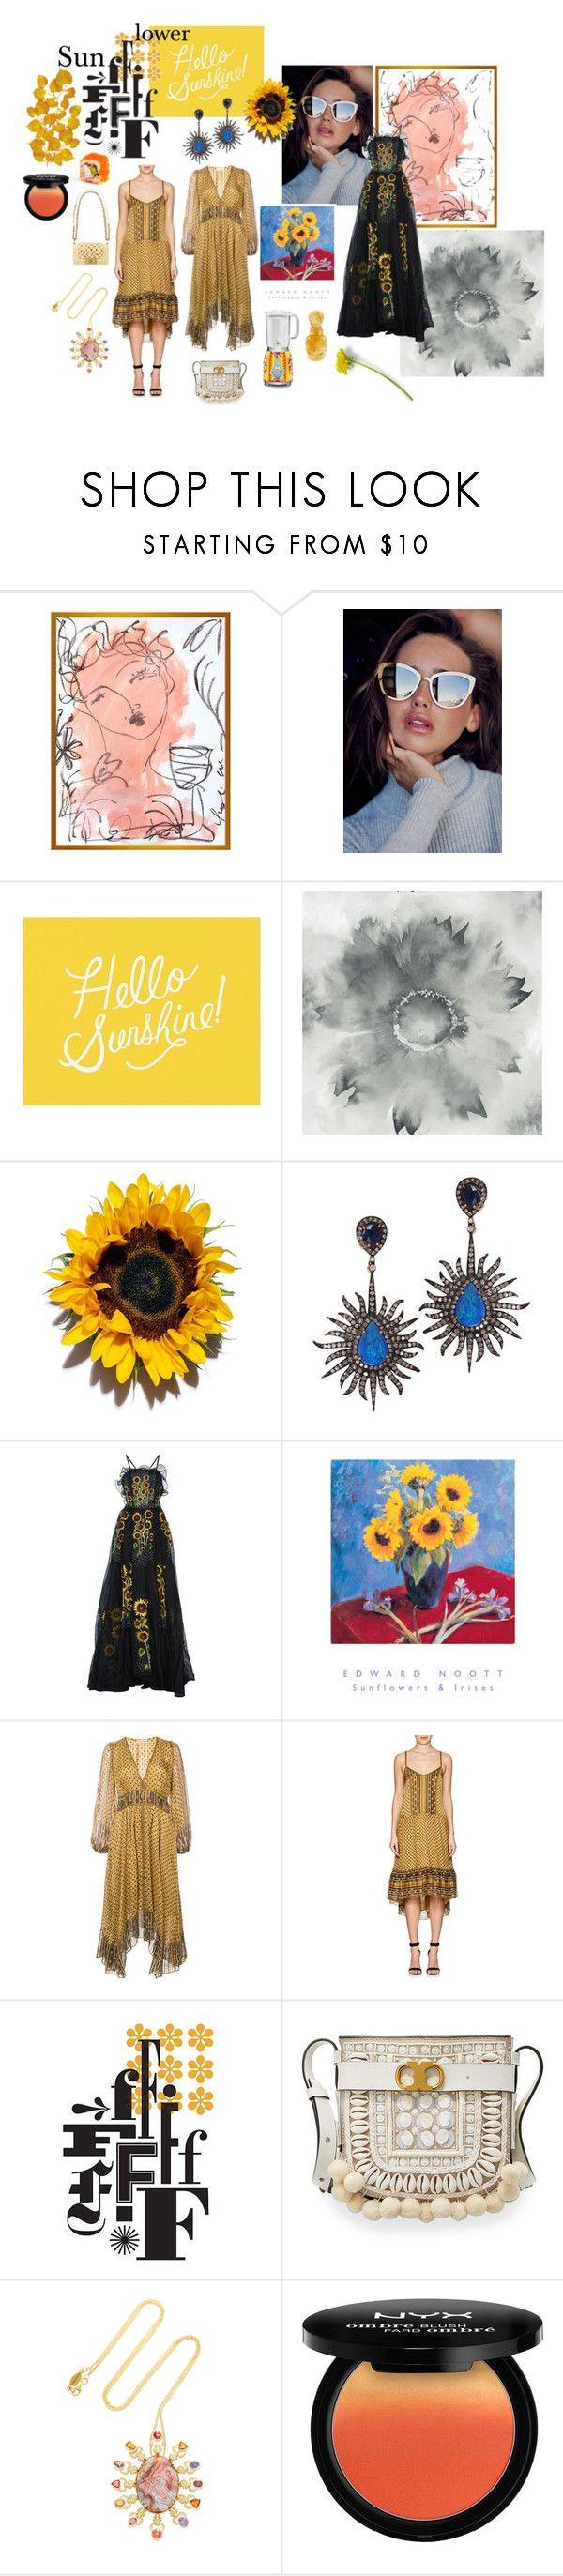 """Sunflower"" by sarahhughes-net on Polyvore featuring Leslie Weaver, Pottery Barn, Plukka, Rahul Mishra, Ulla Johnson, Mark & Graham, Chanel, Tory Burch, Daniela Villegas and NYX"